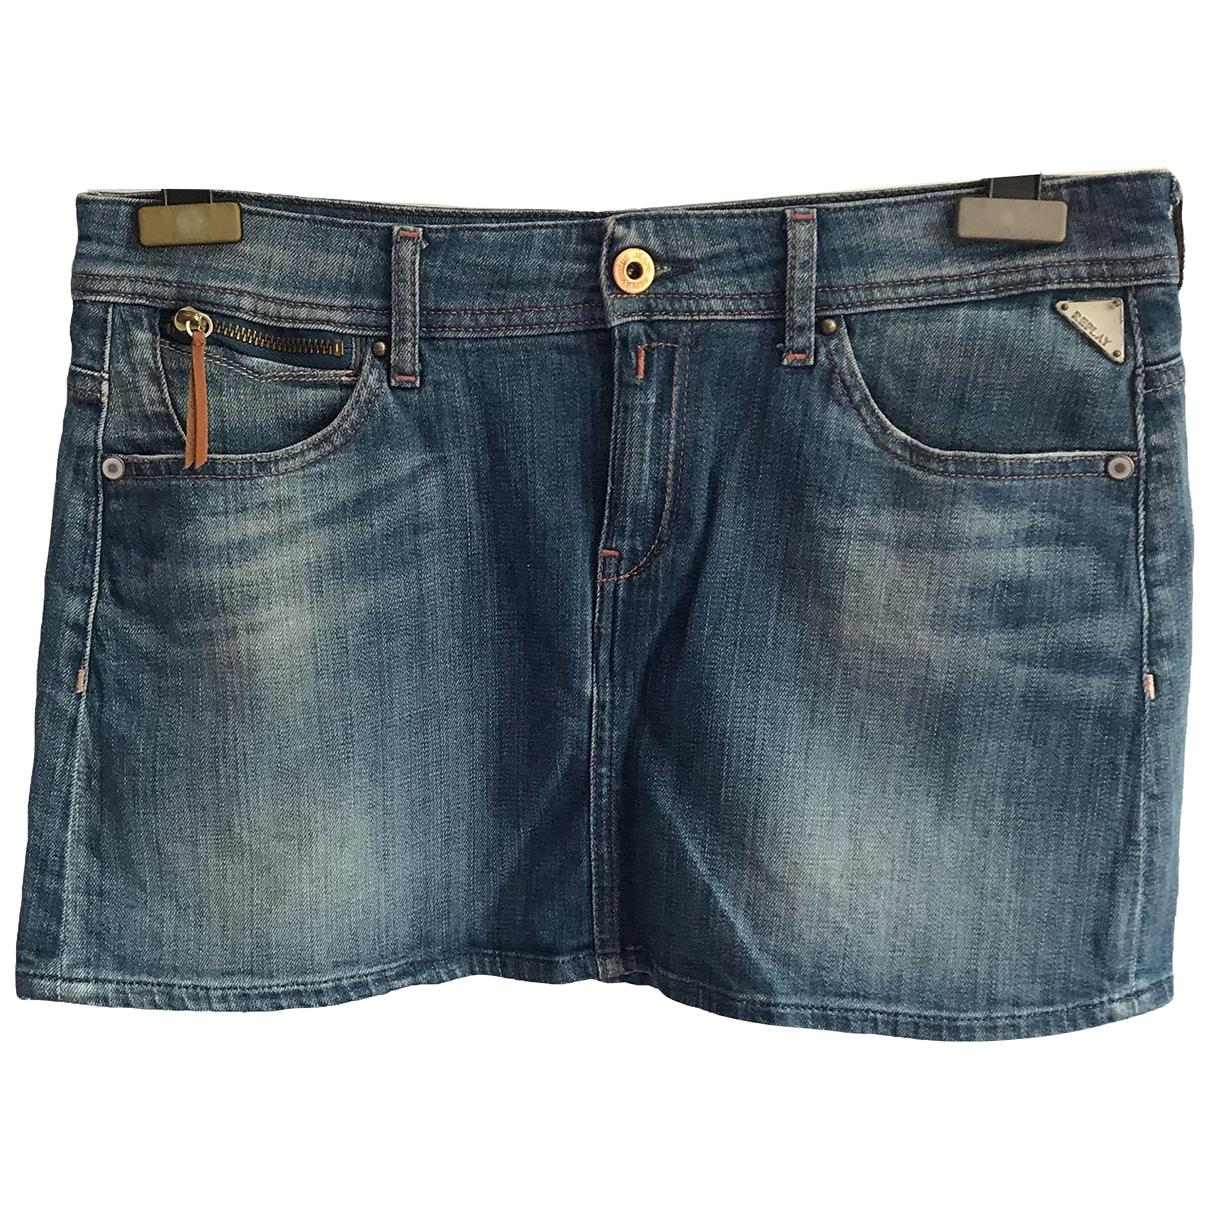 Replay \N Blue Cotton - elasthane skirt for Women 44 IT